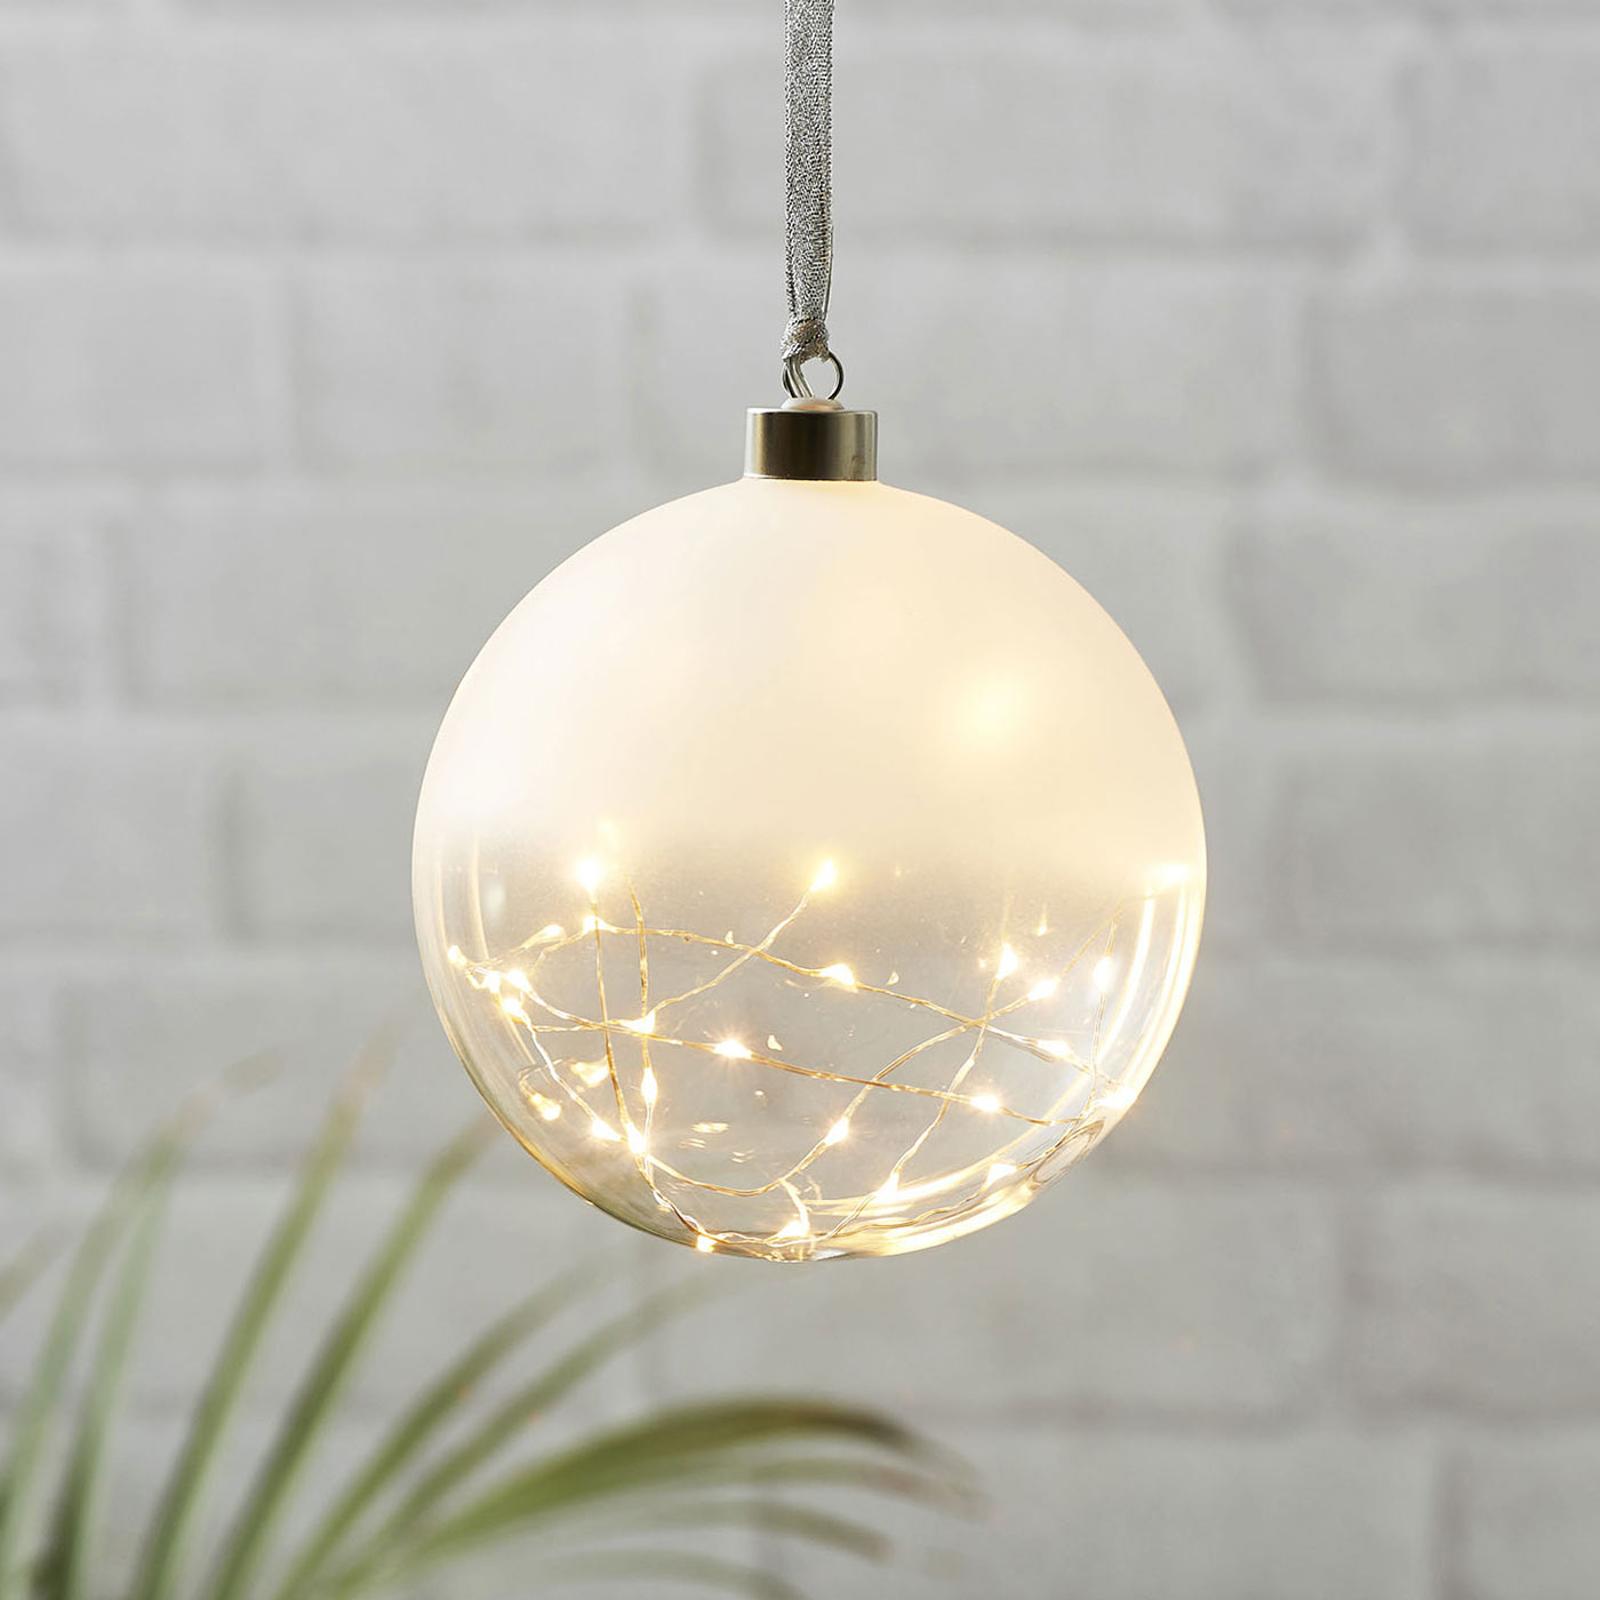 Glow LED-dekokugle, frostet/klar, Ø 15 cm